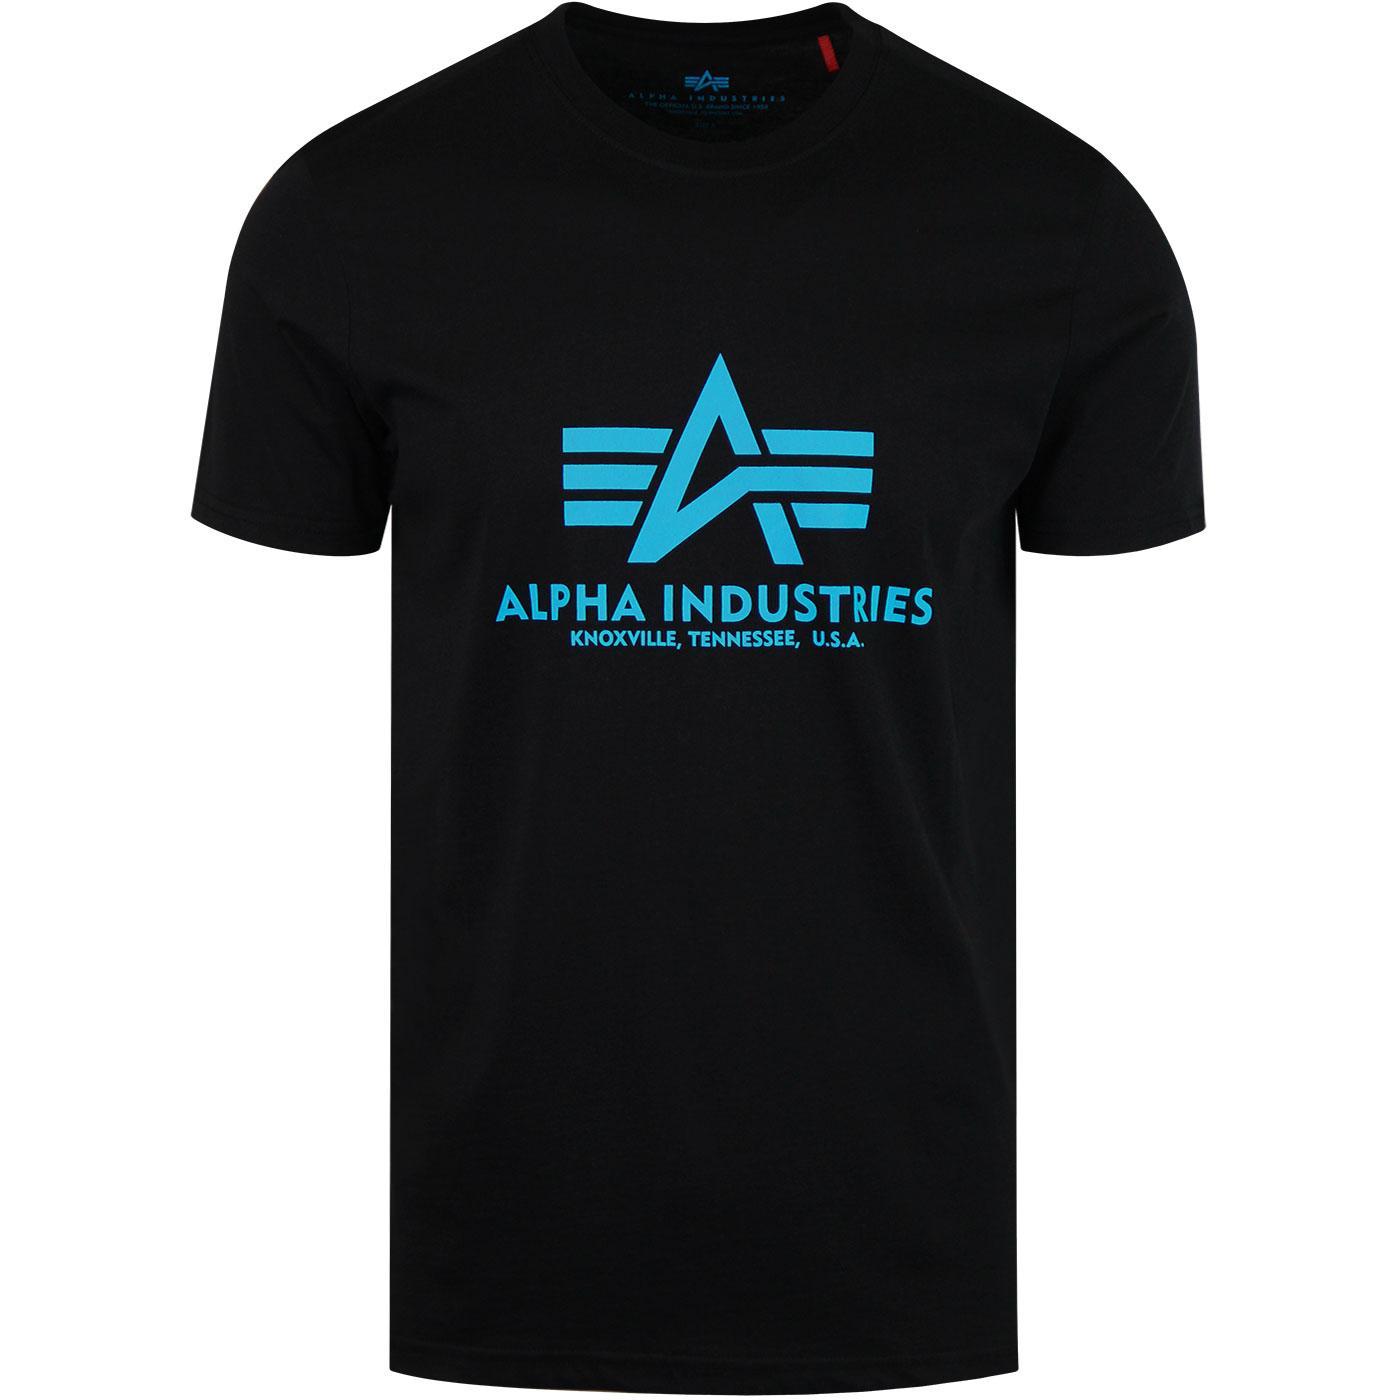 ALPHA INDUSTRIES Retro Basic Logo Tee Black/Blue